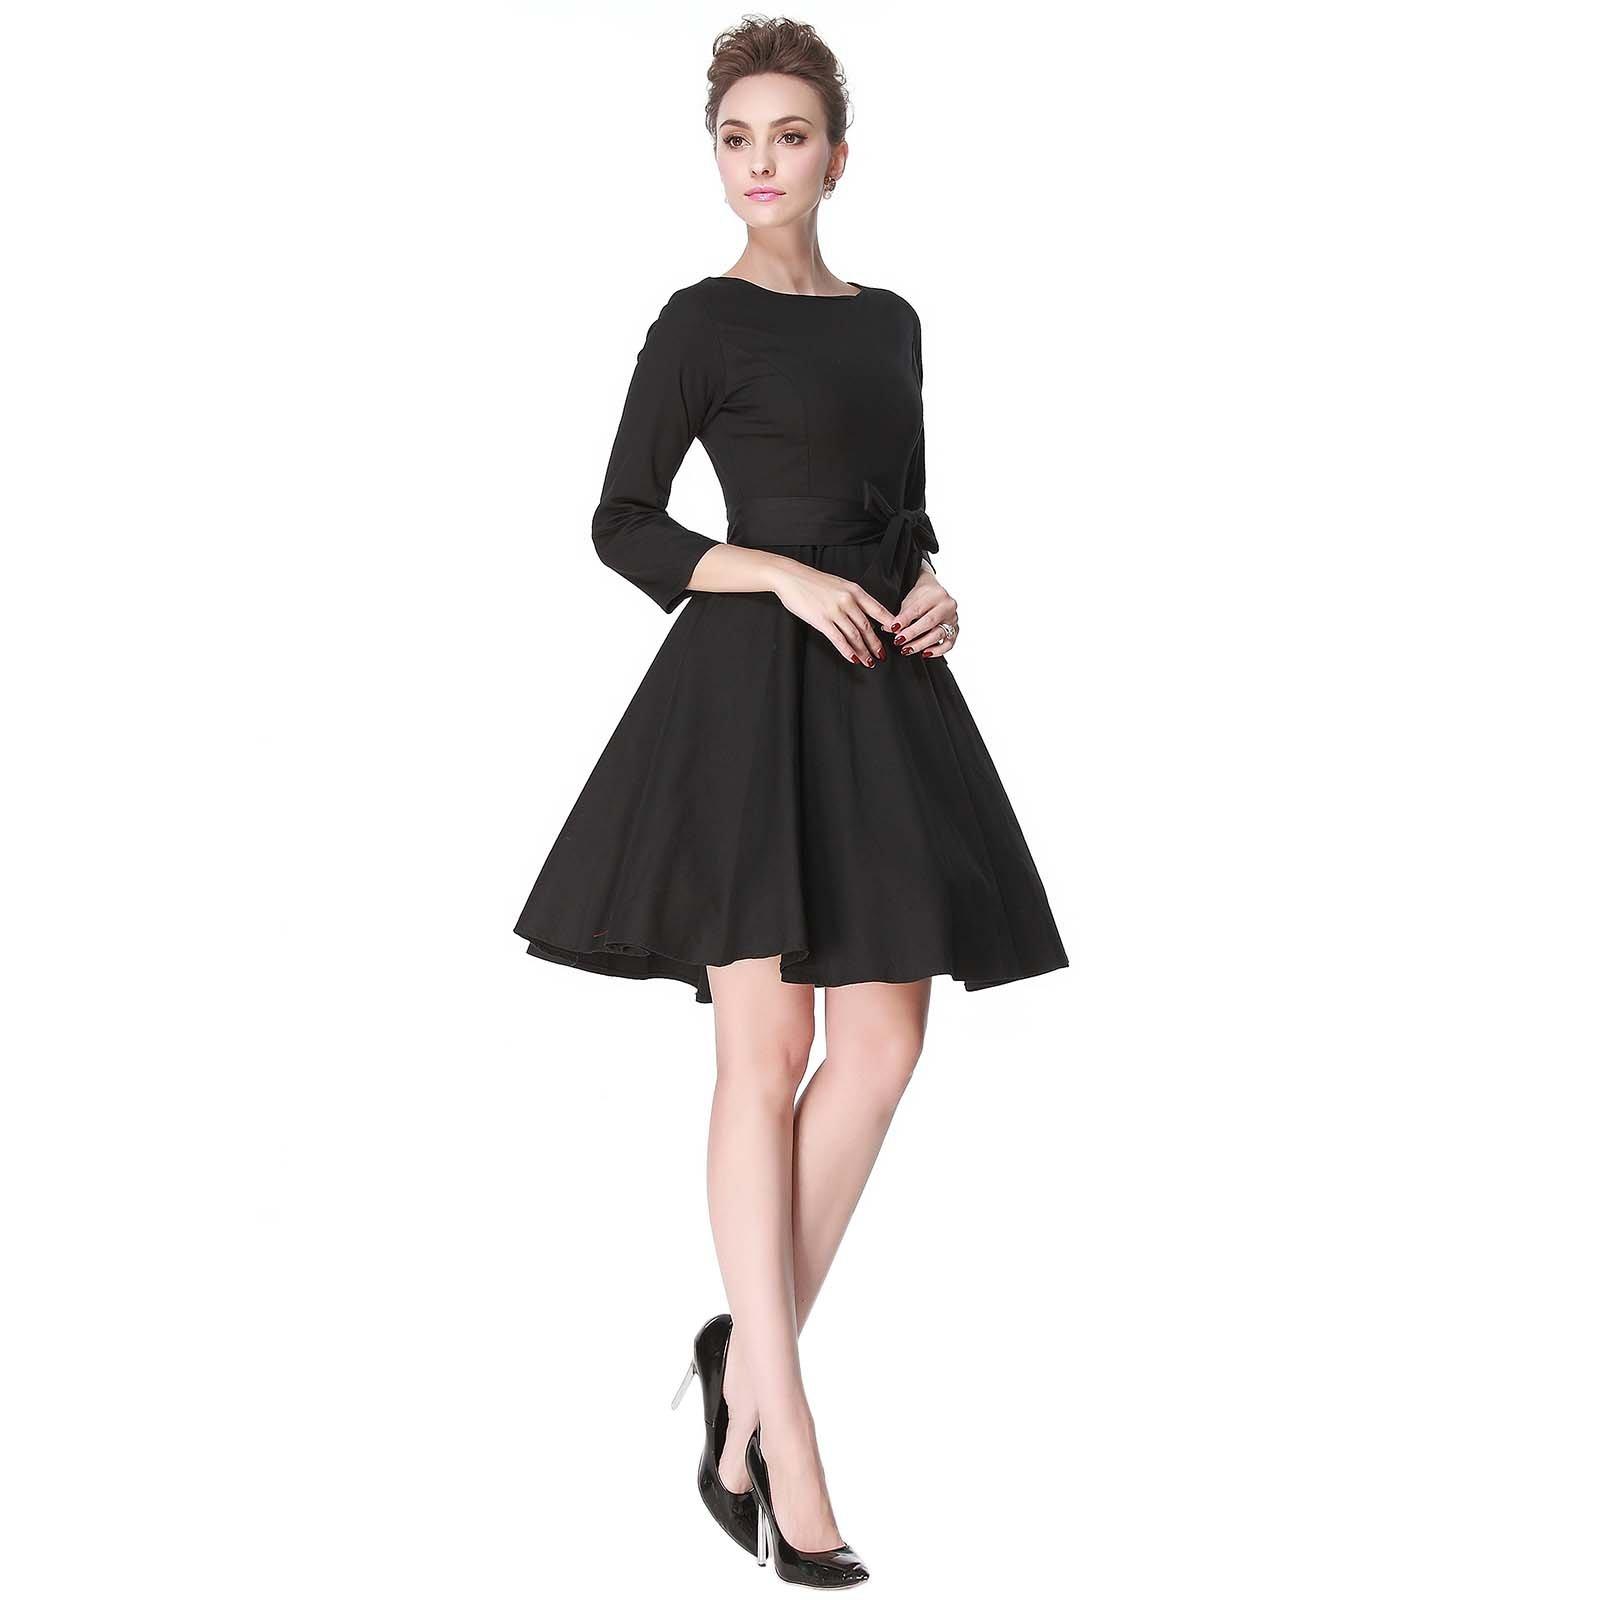 Heroecol 50s 60s Hepburn 3/4 Sleeve Style Vintage Retro Swing Rockailly Dresses Size XL Color Black by Heroecol (Image #5)